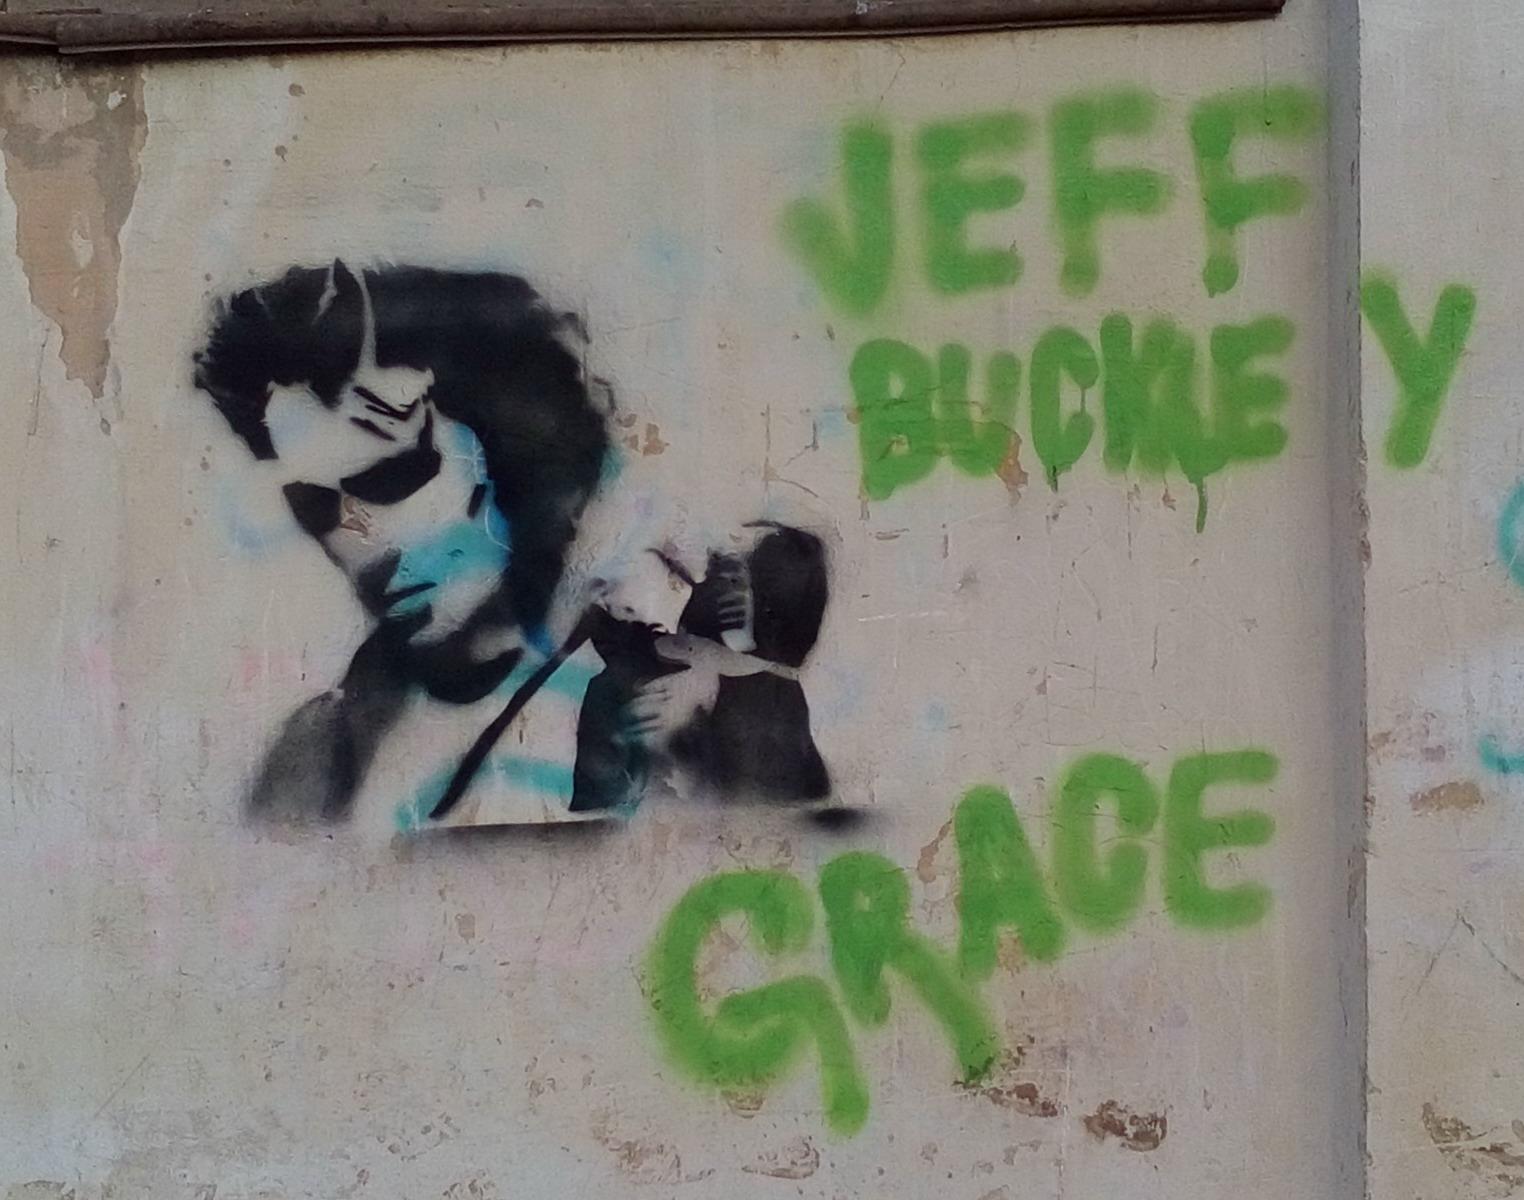 Photo Jeff Buckley via Opendata BNF